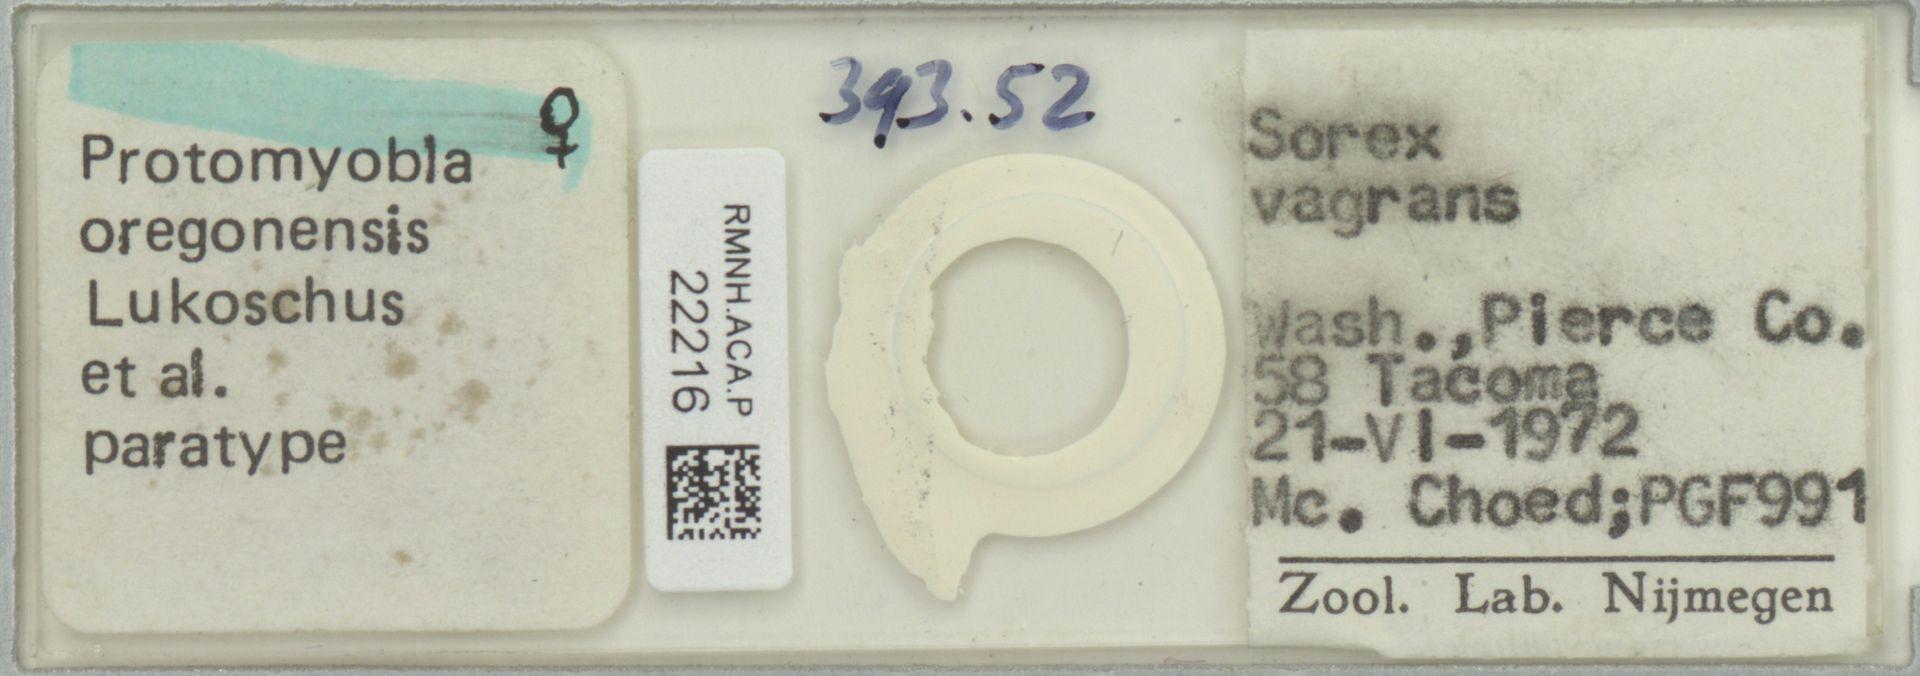 RMNH.ACA.P.22216 | Protomyobia oregonensis